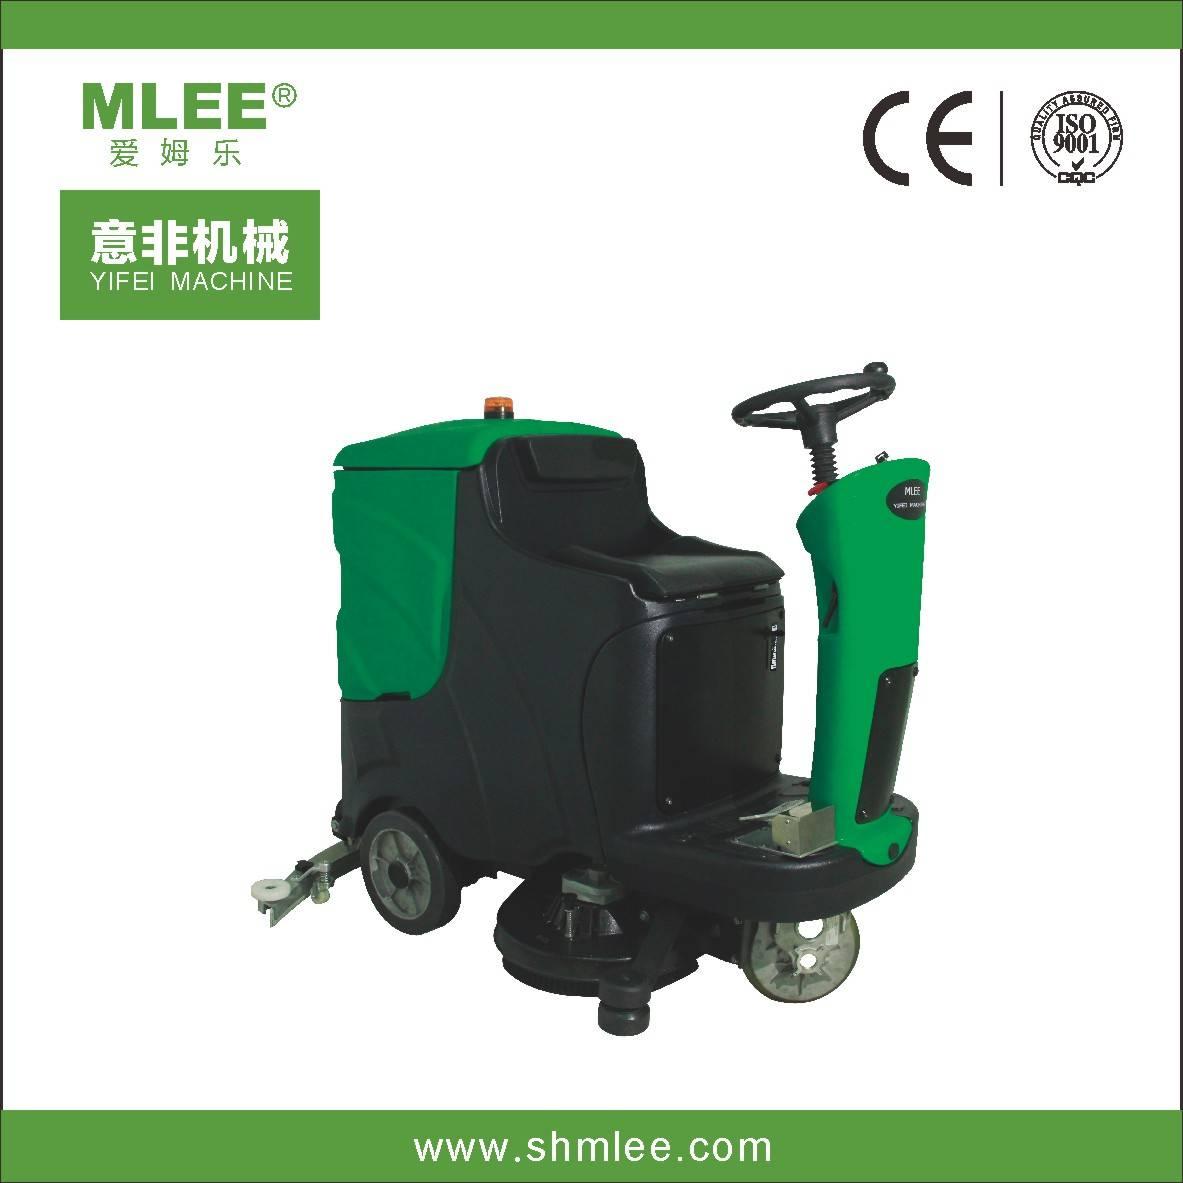 MLEE850BT ride on washing machine floor scrubber dryer floor sweeper